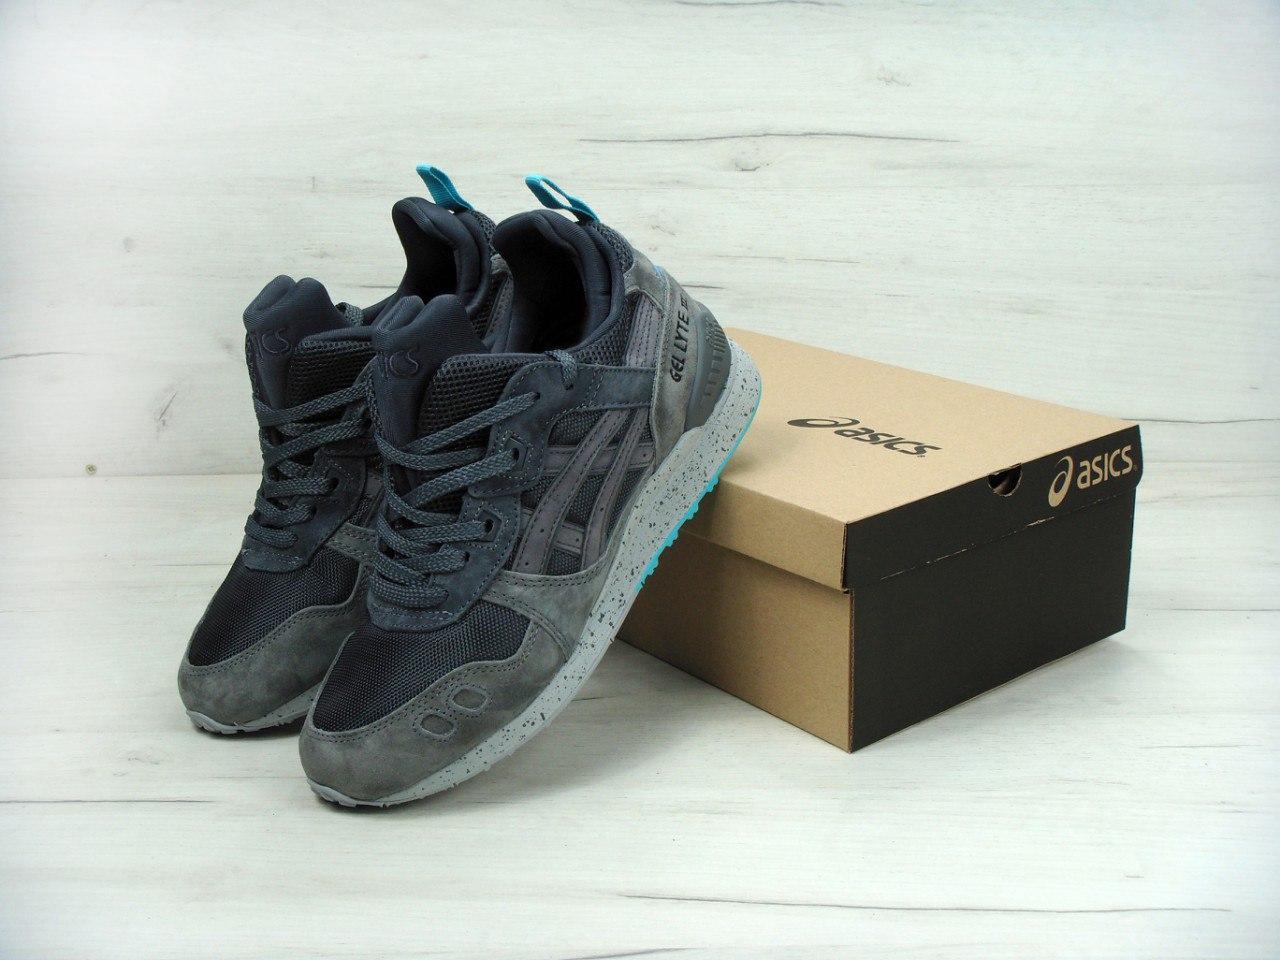 60e1fe19aceb79 Кроссовки мужские Asics Gel Lyte III MT SneakerBoot Grey/Grey Реплика -  Work Hard Shop